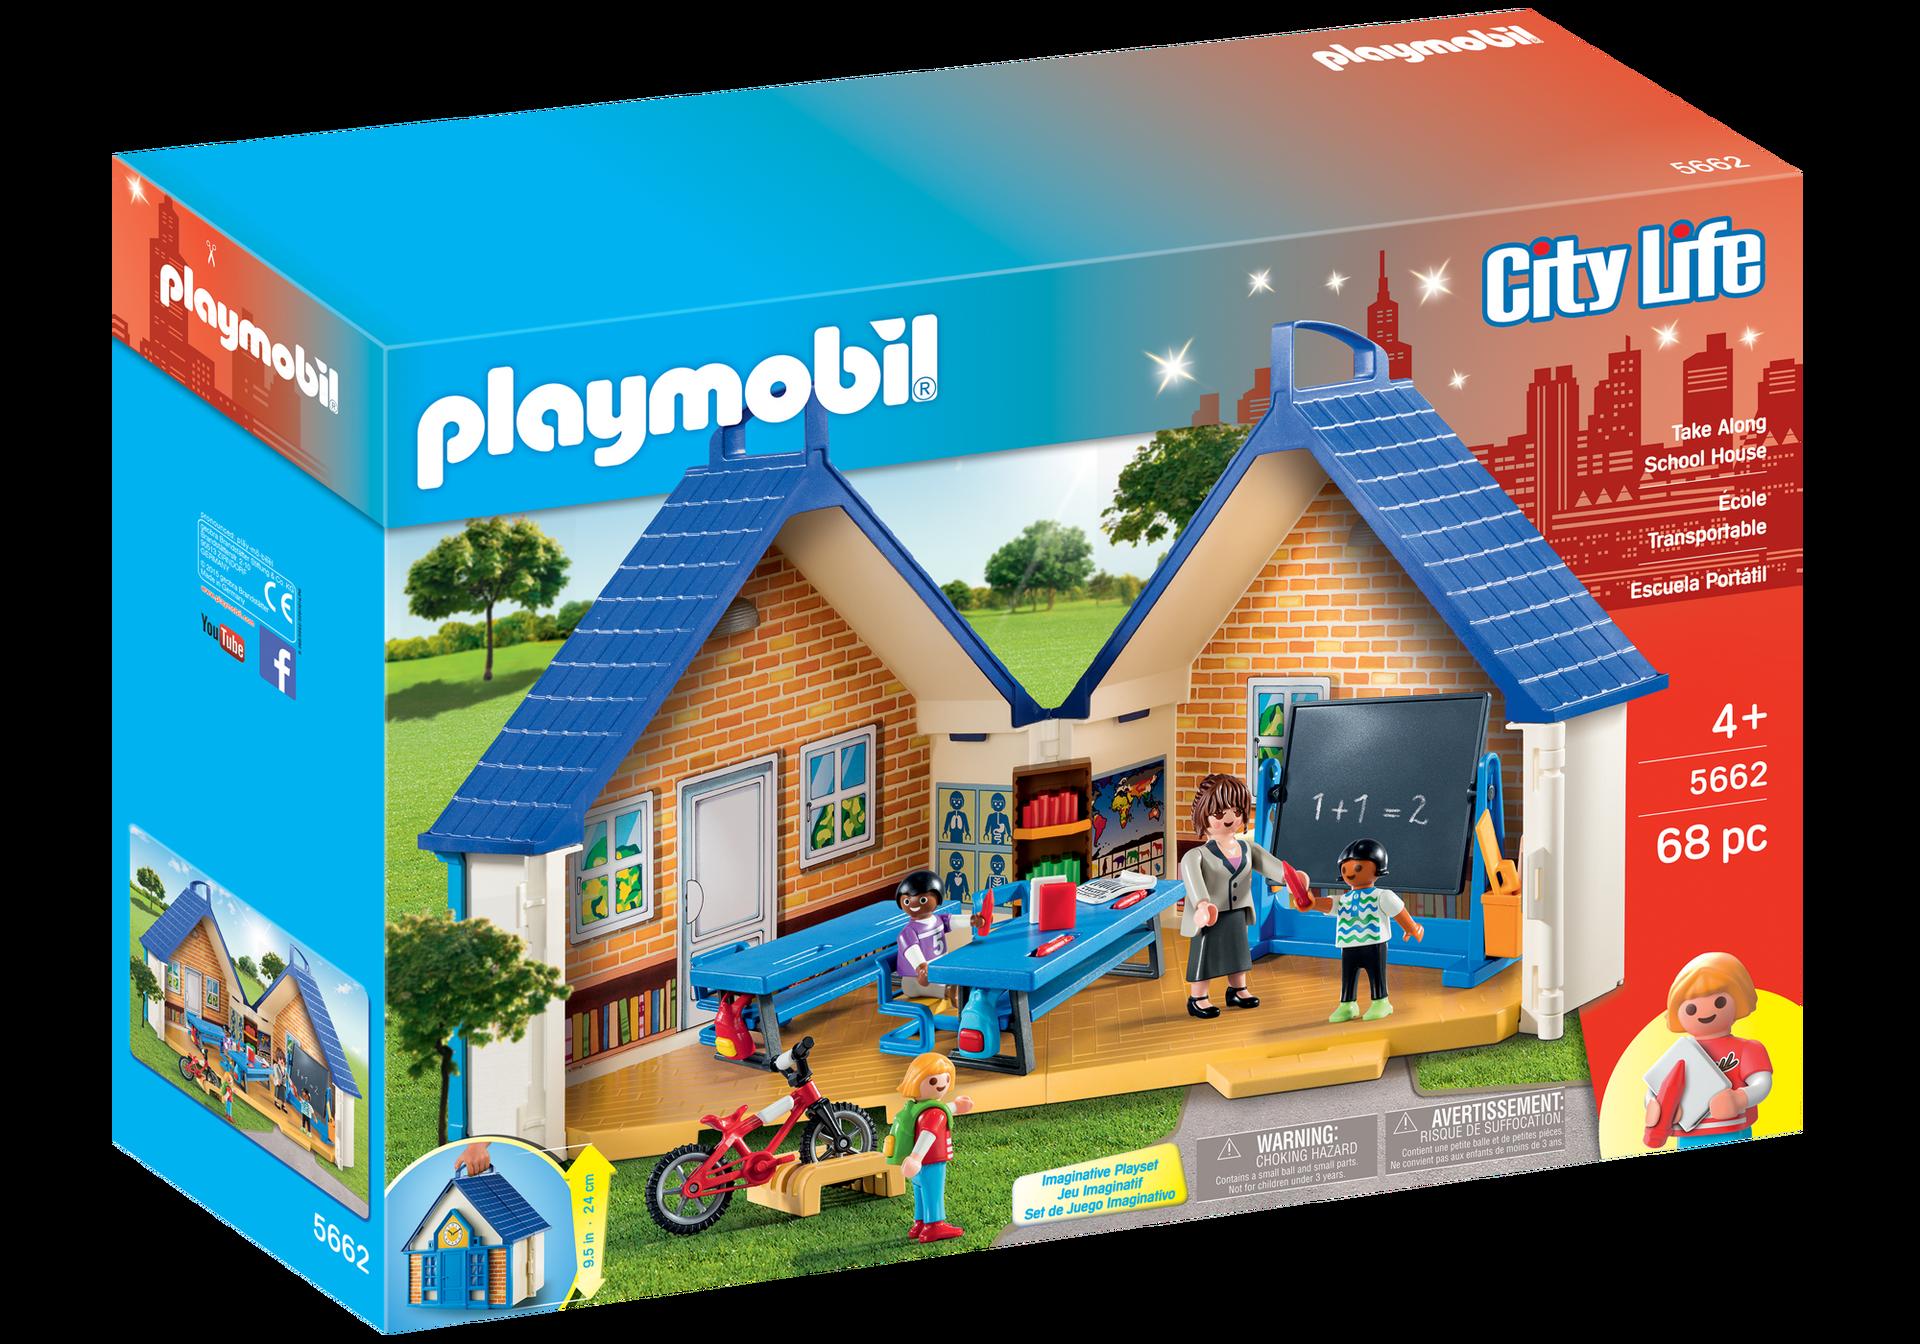 Take along school house 5662 playmobil usa for Hospital de playmobil